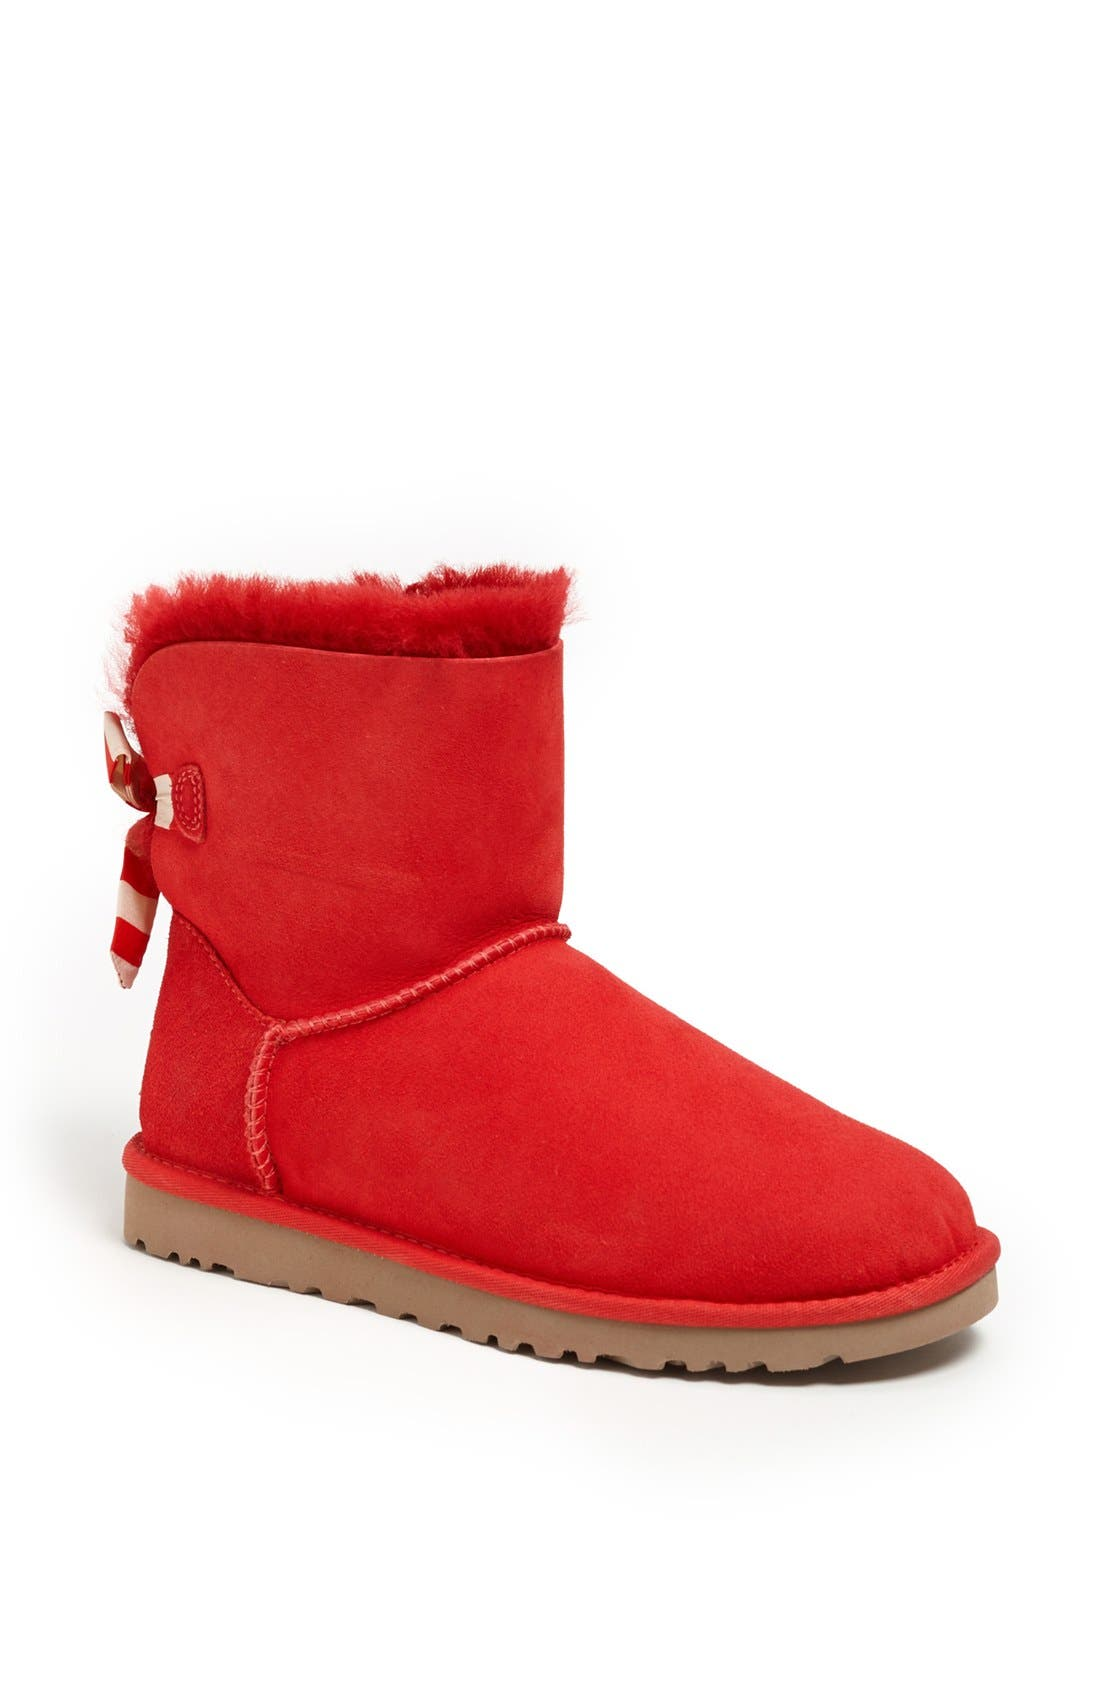 Alternate Image 1 Selected - UGG® Australia 'Mini Bailey Button Bow' Boot (Women)